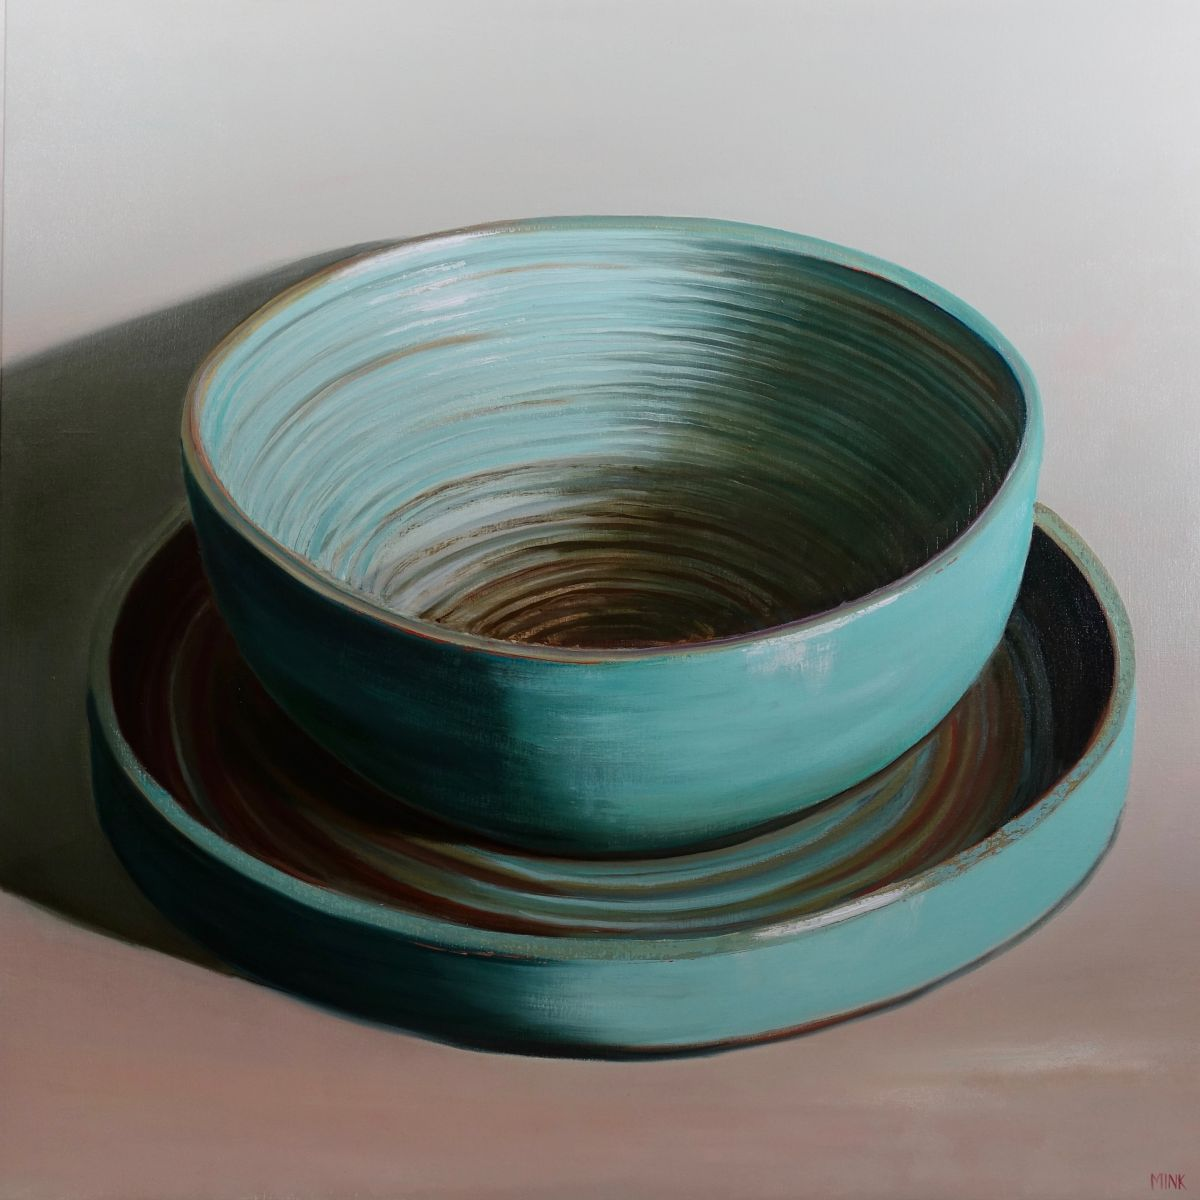 Kunst: The Hague – Plate and Bowl van kunstenaar Minke Buikema